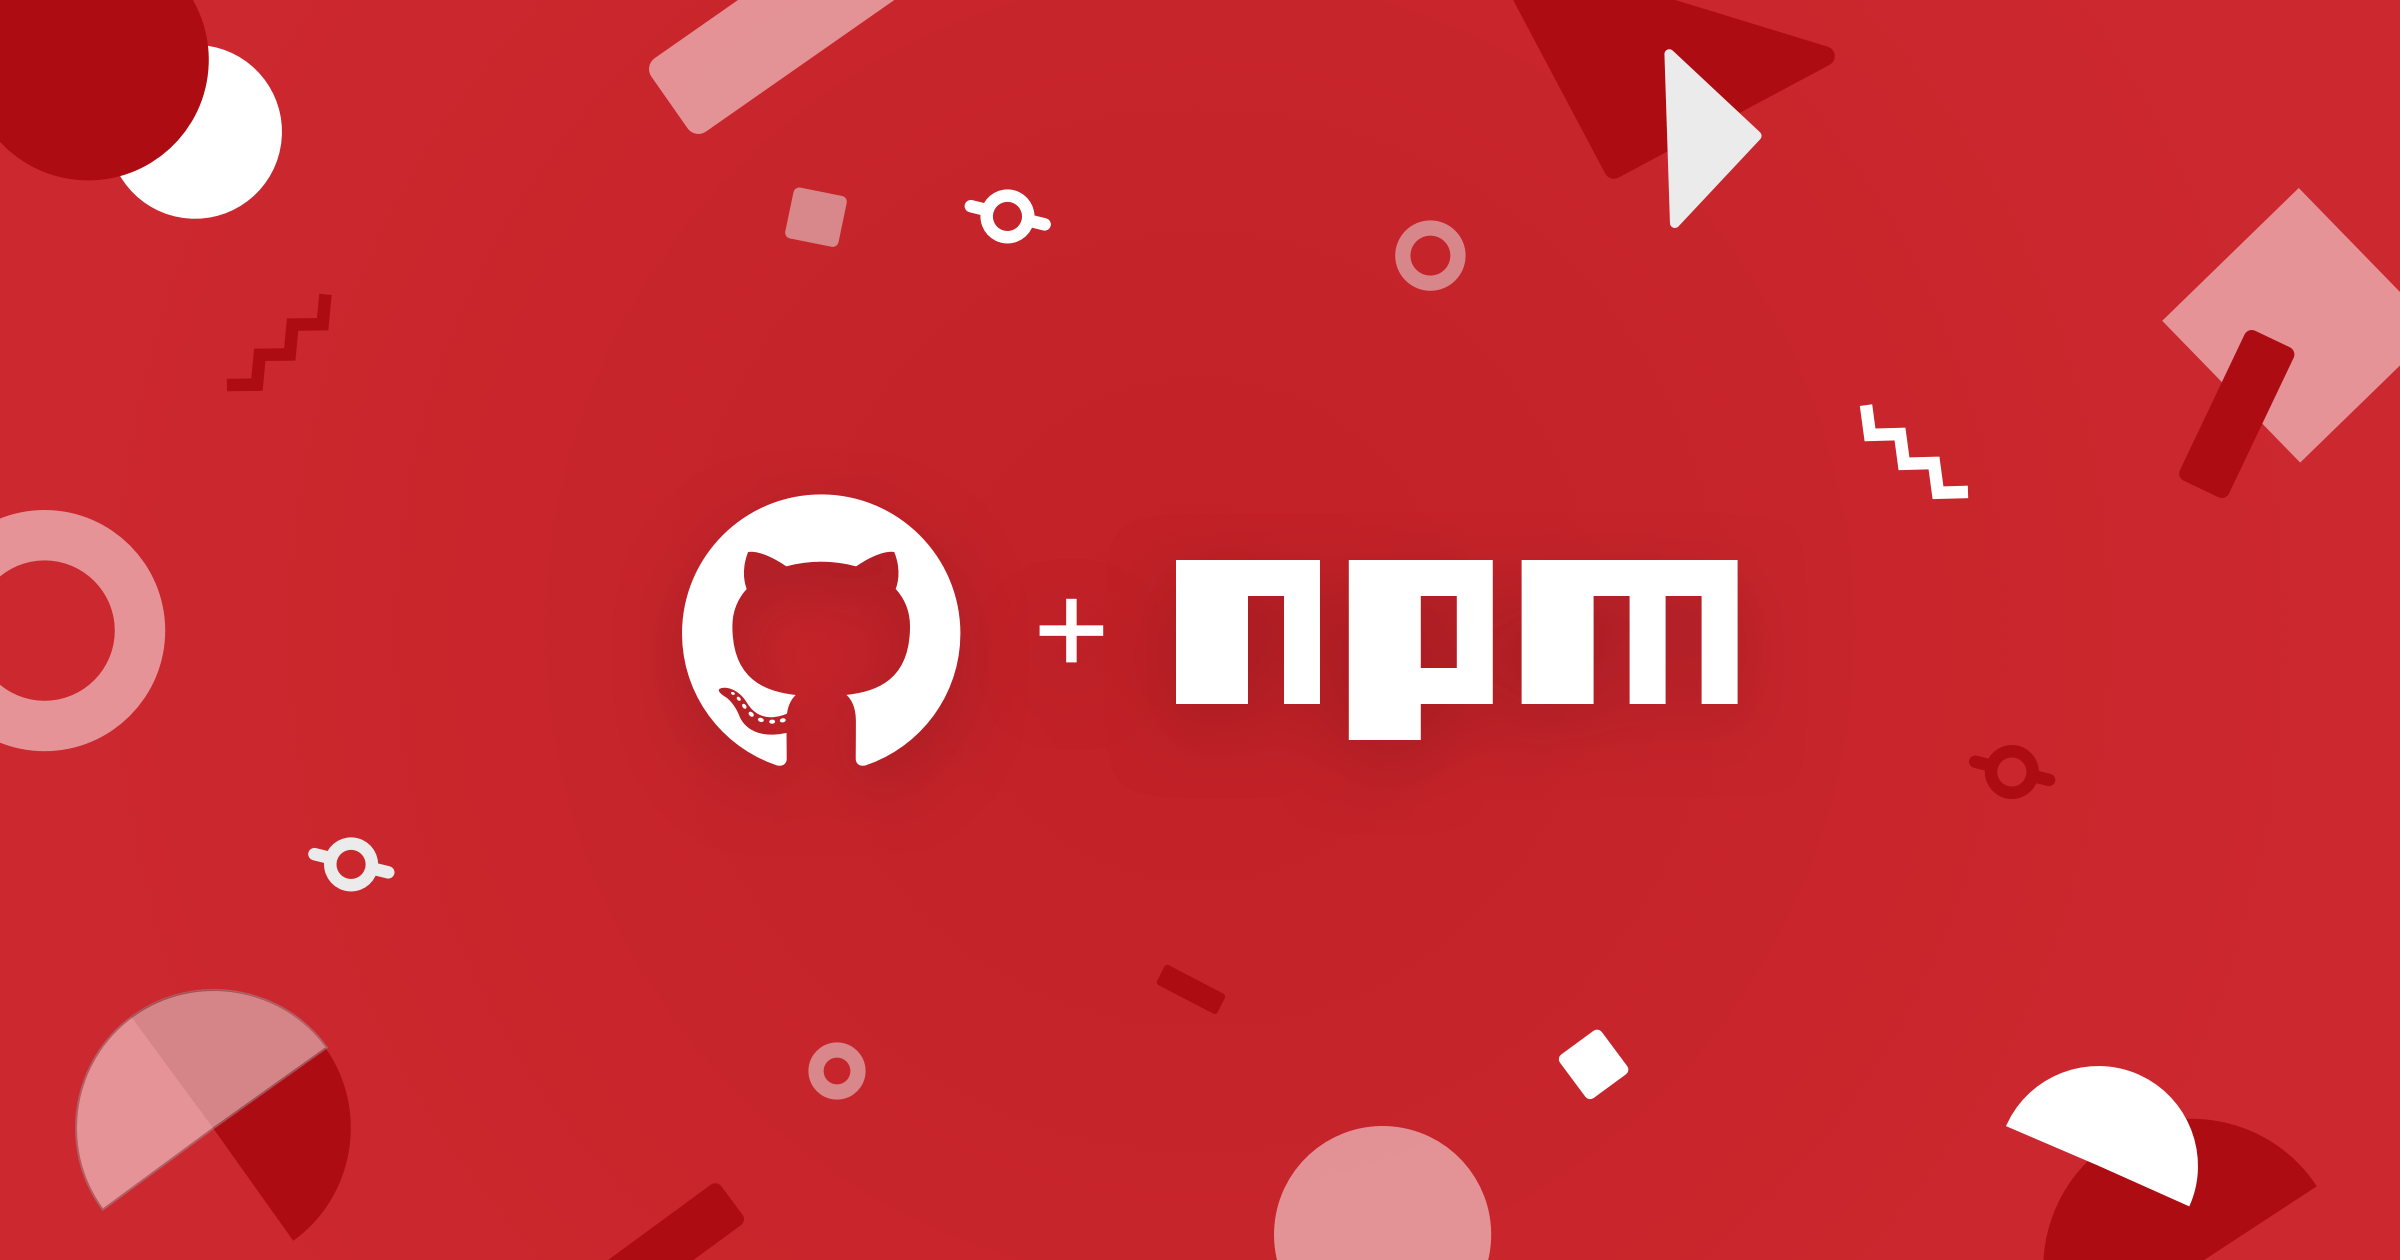 На портале npm обнаружено четыре пакета с вредоносным кодом